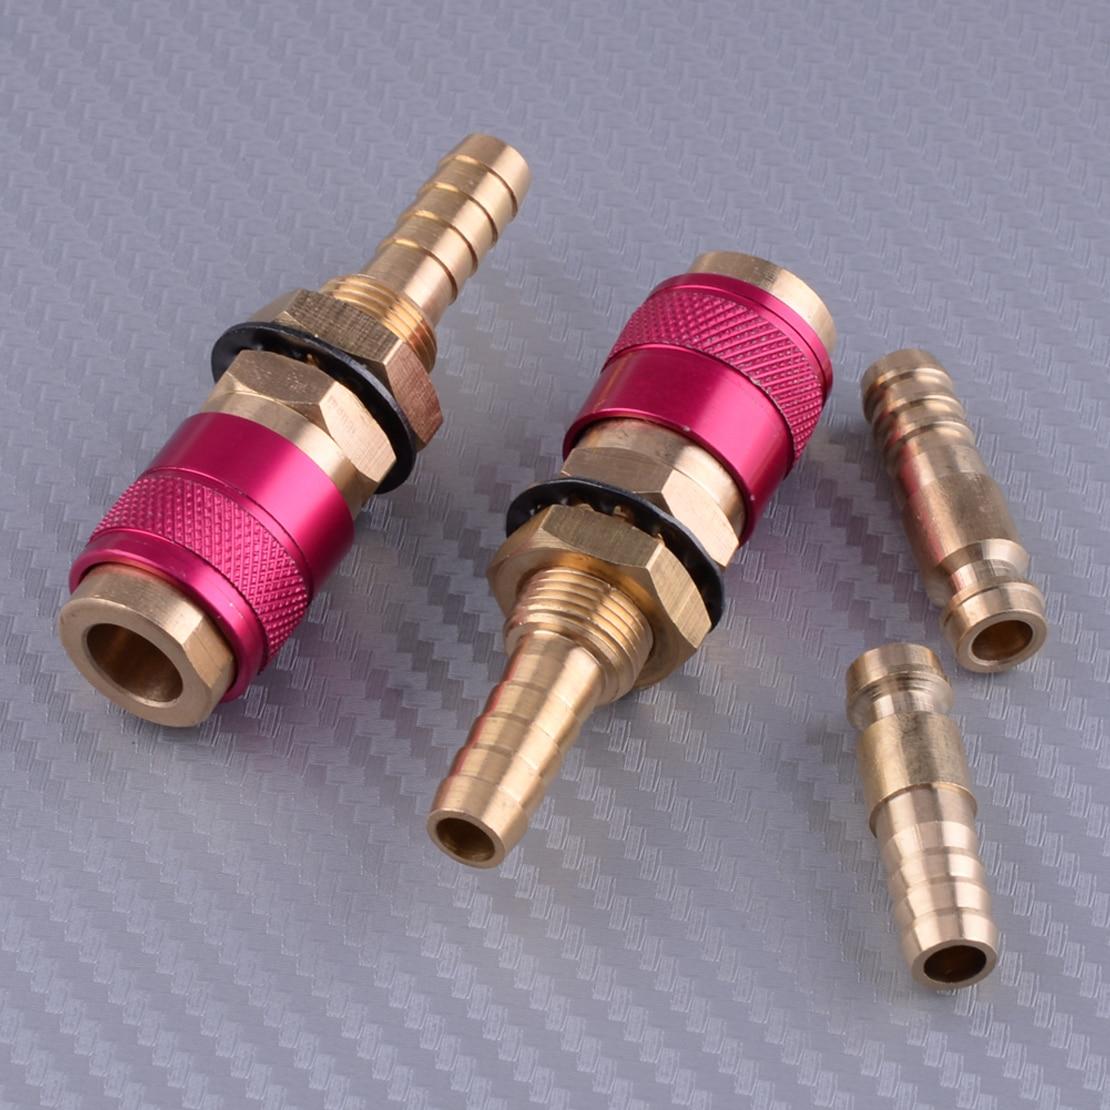 LETAOSK 2 stücke M8 Rot Wig-schweißbrenner Wasser Gekühlt & Gas Adapter Schnell Anschluss Fitting Tool